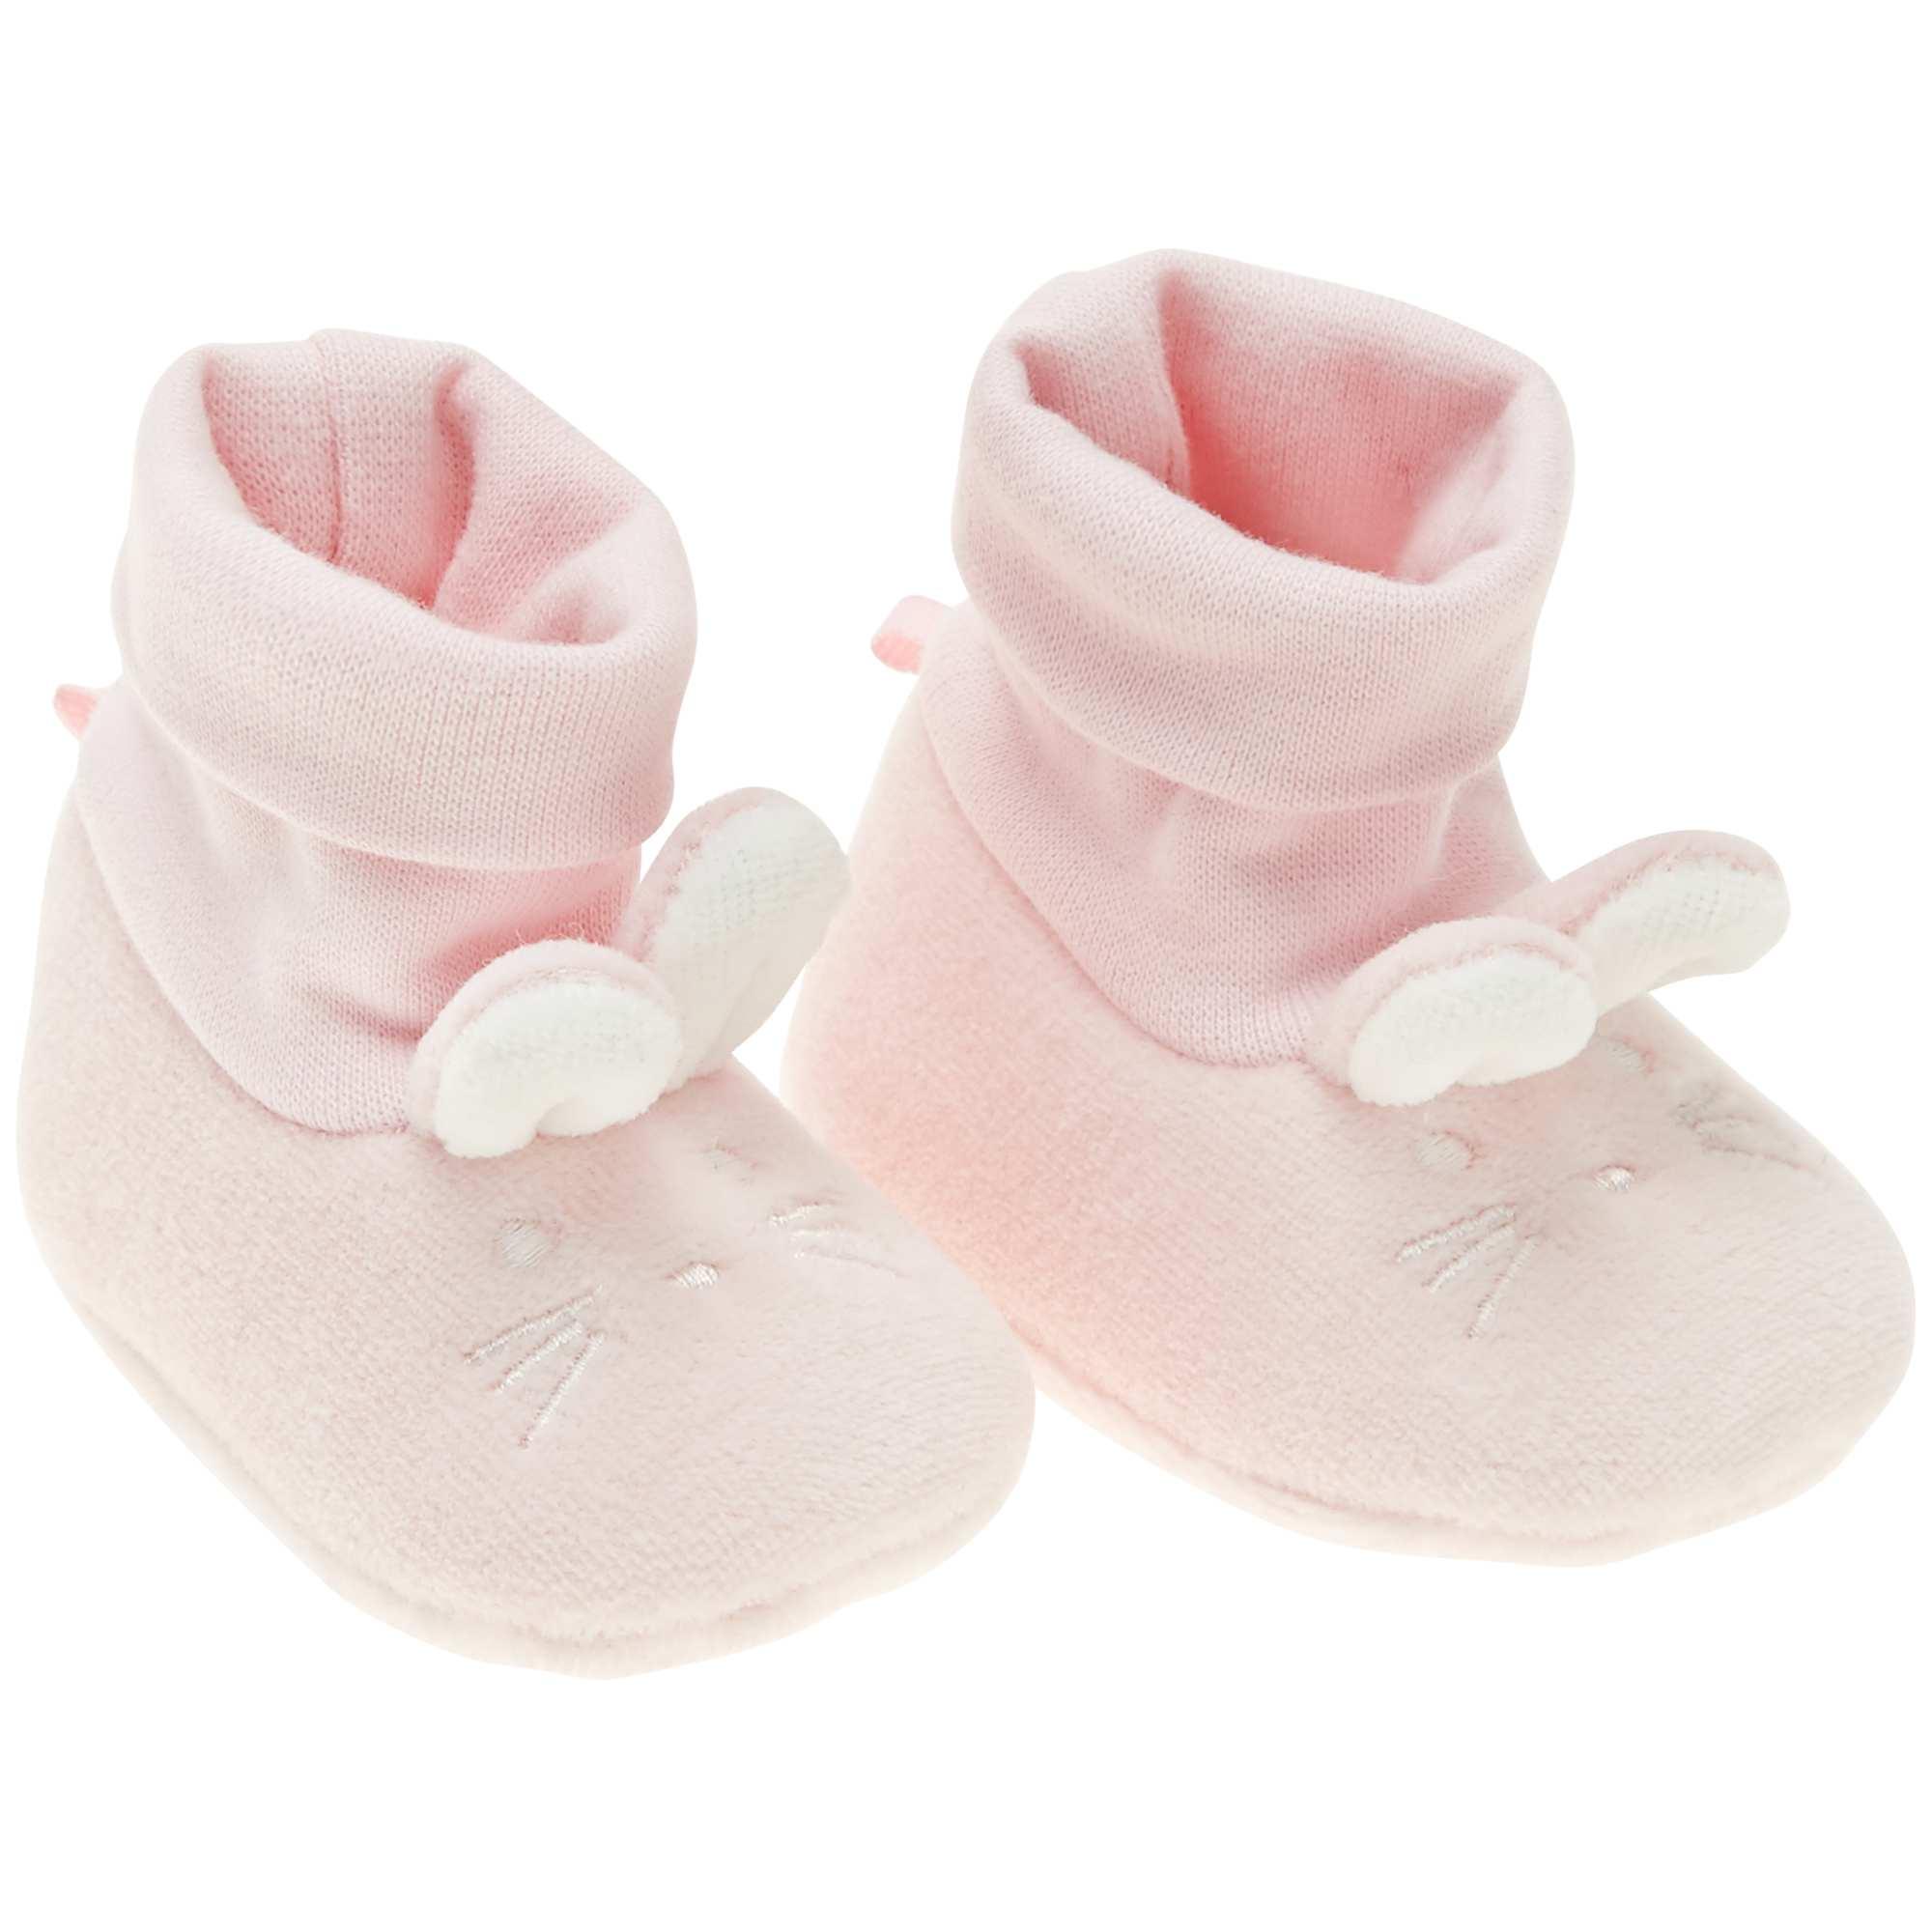 Roze Babykleding.Pantoffels Met Konijn Meisjes Babykleding Roze Kiabi 5 00